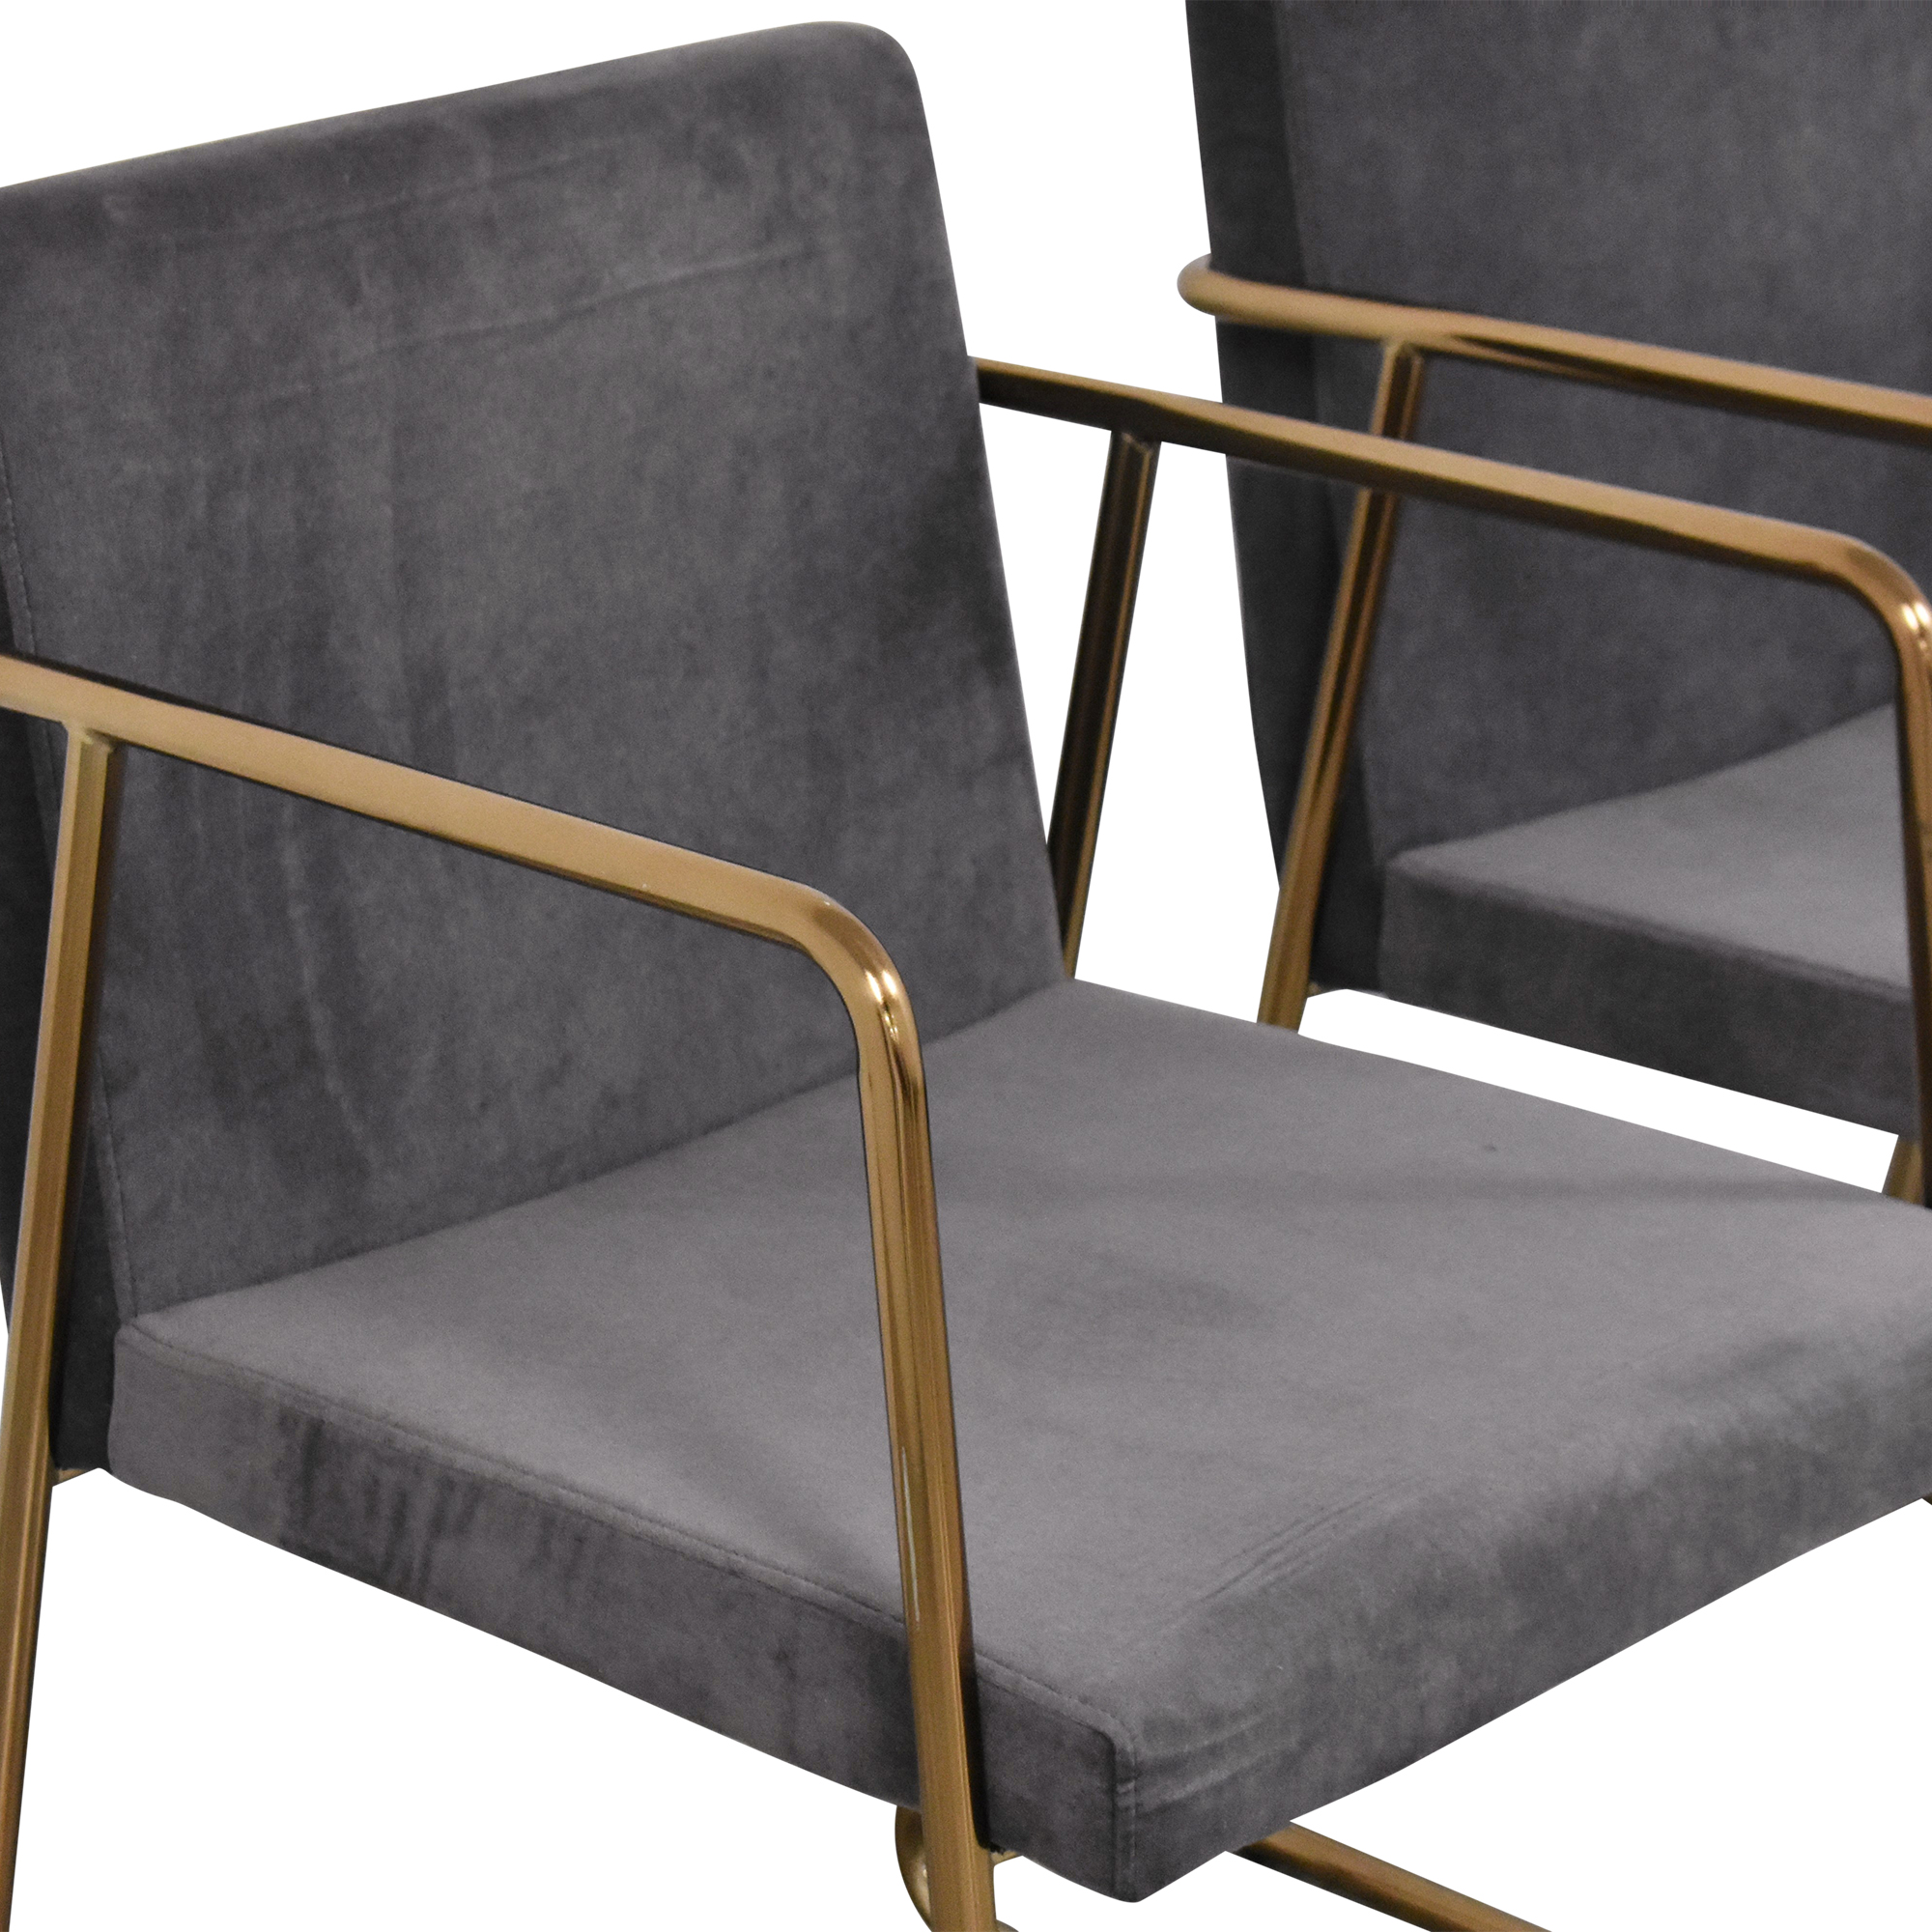 CB2 CB2 Rouka Chairs second hand